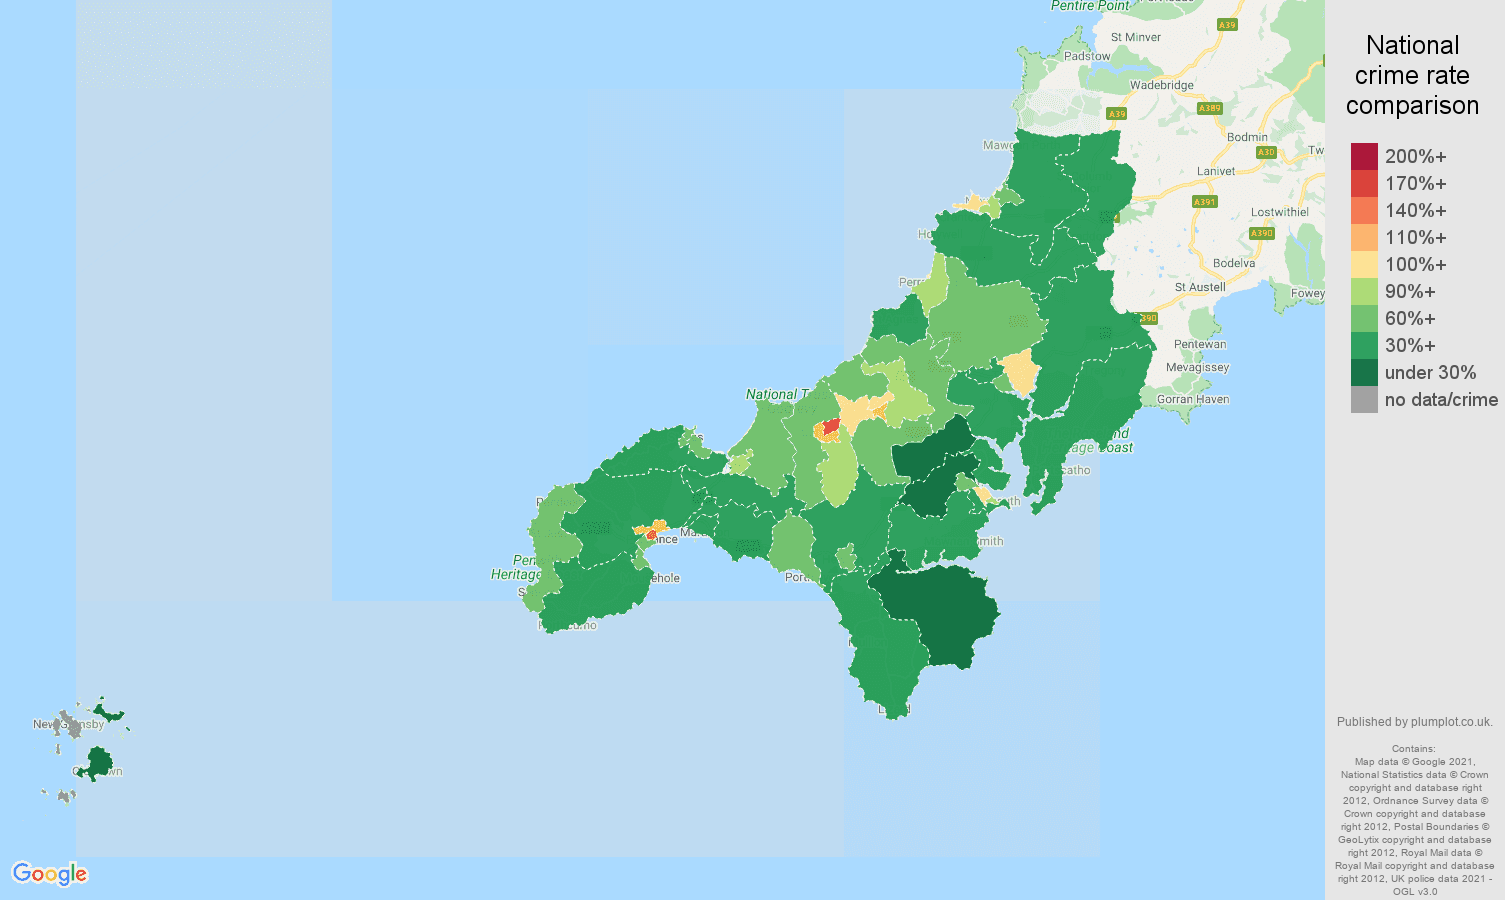 Truro violent crime rate comparison map